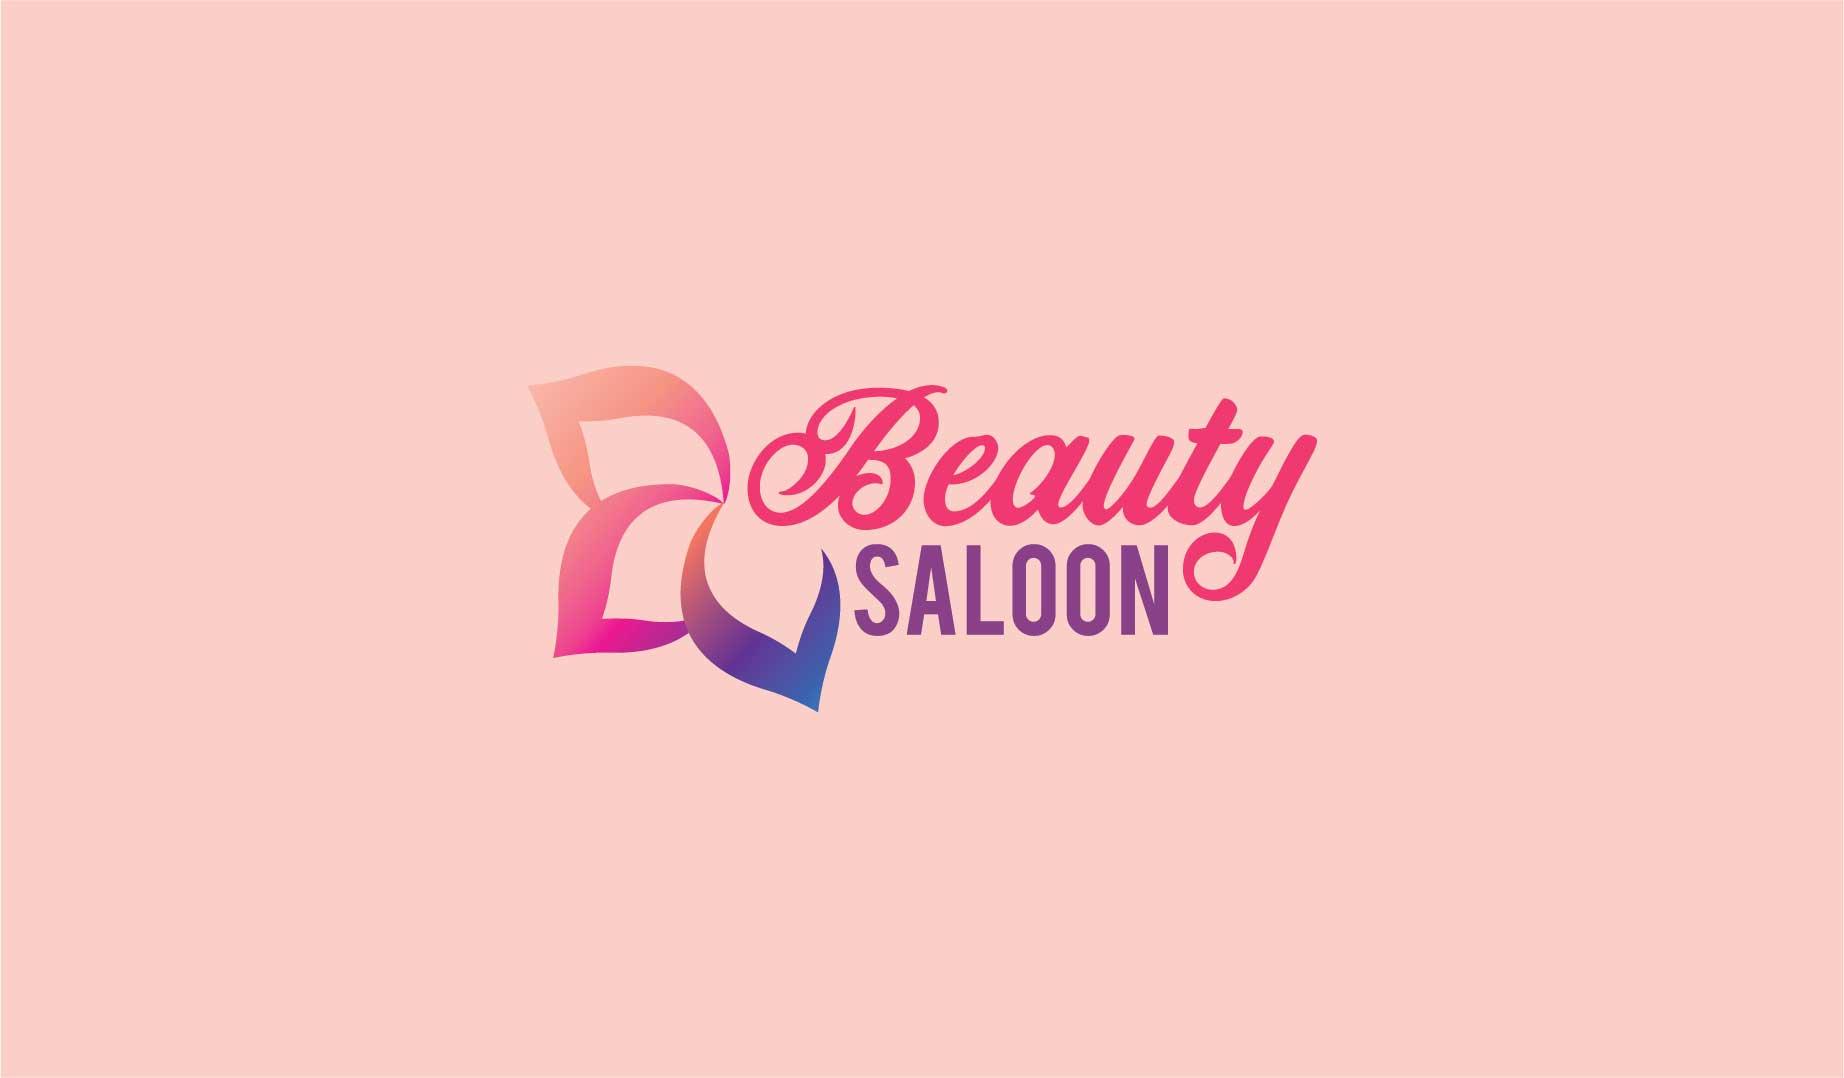 logo design service for Beauty Saloon